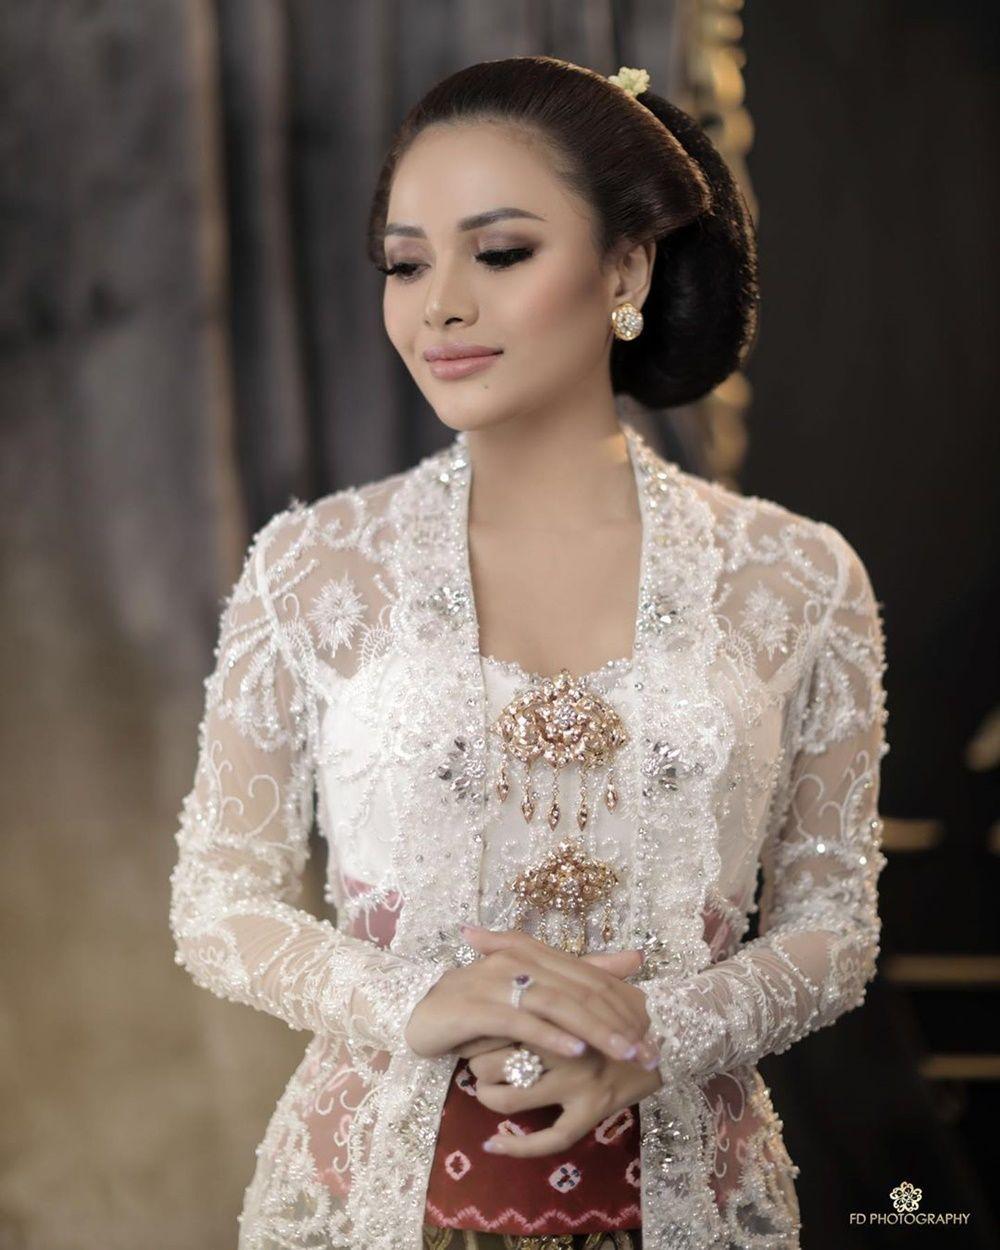 9 Foto Romantis Atta Halilintar & Aurel Hermansyah a la Pengantin Jawa